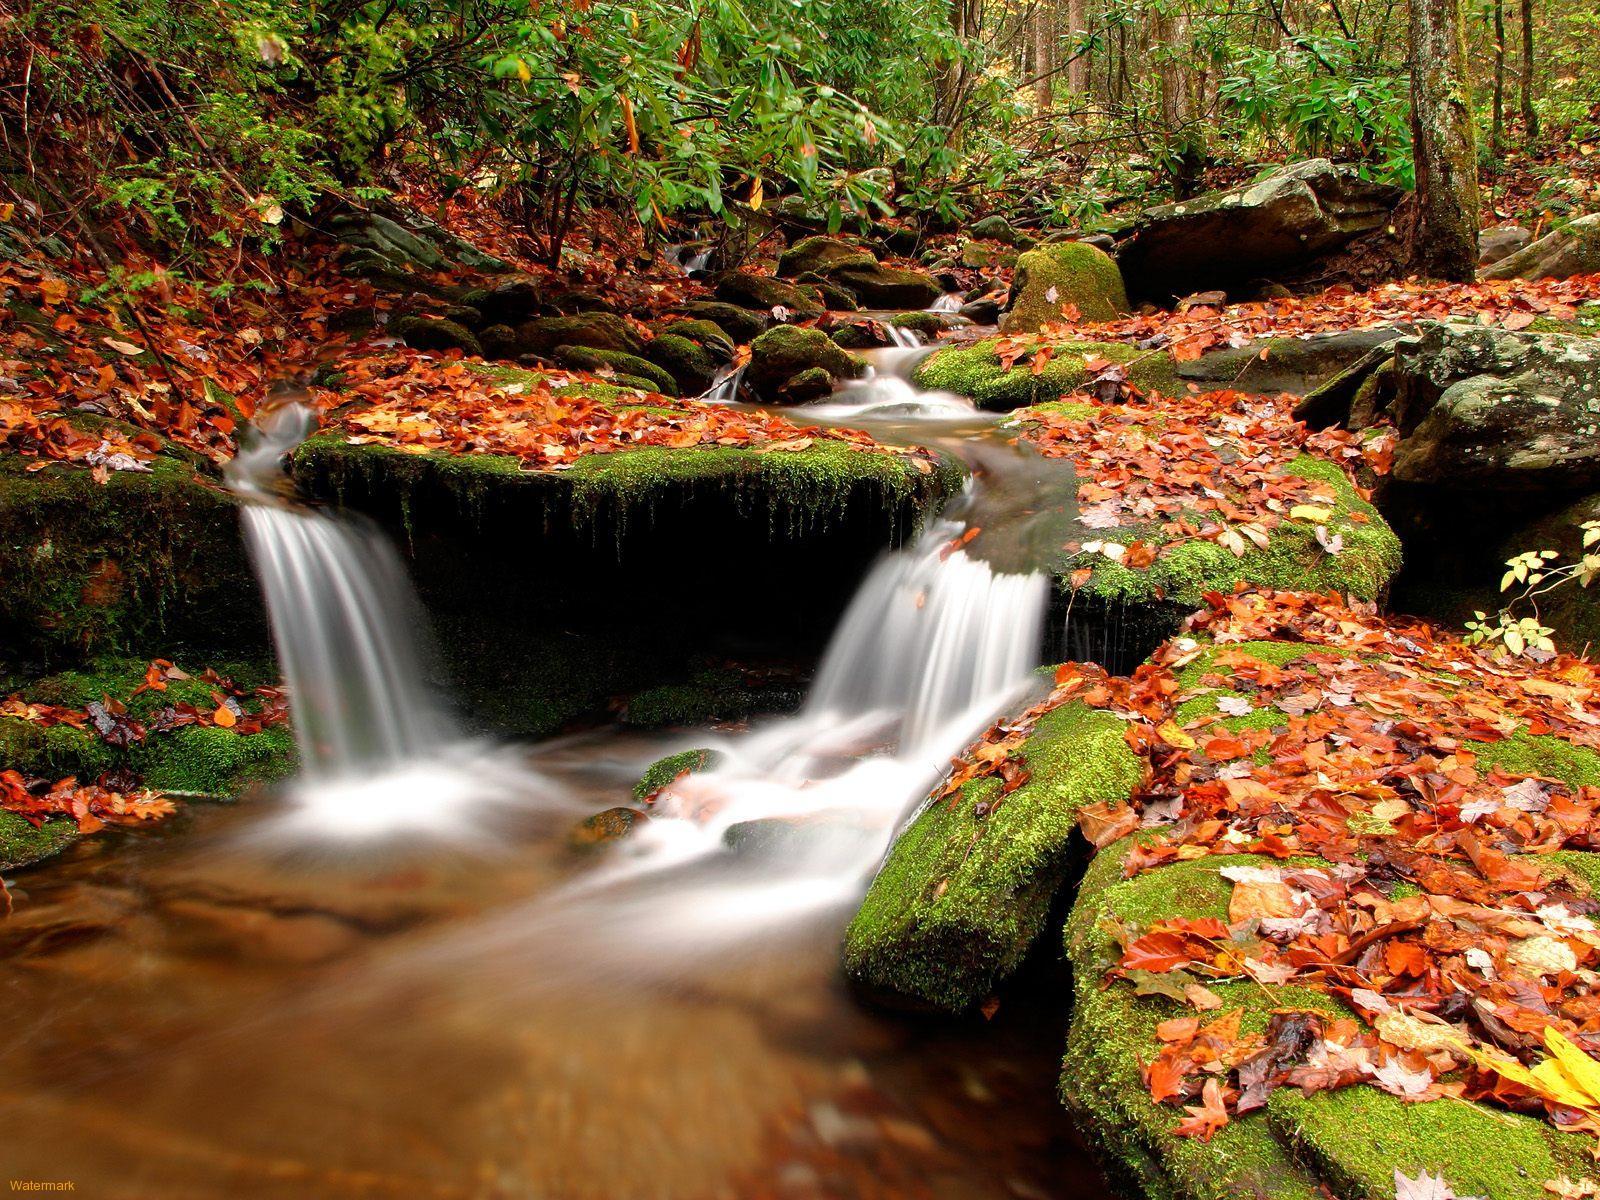 fall colors bass lake washington wisconsin united states 13078htm 1600x1200